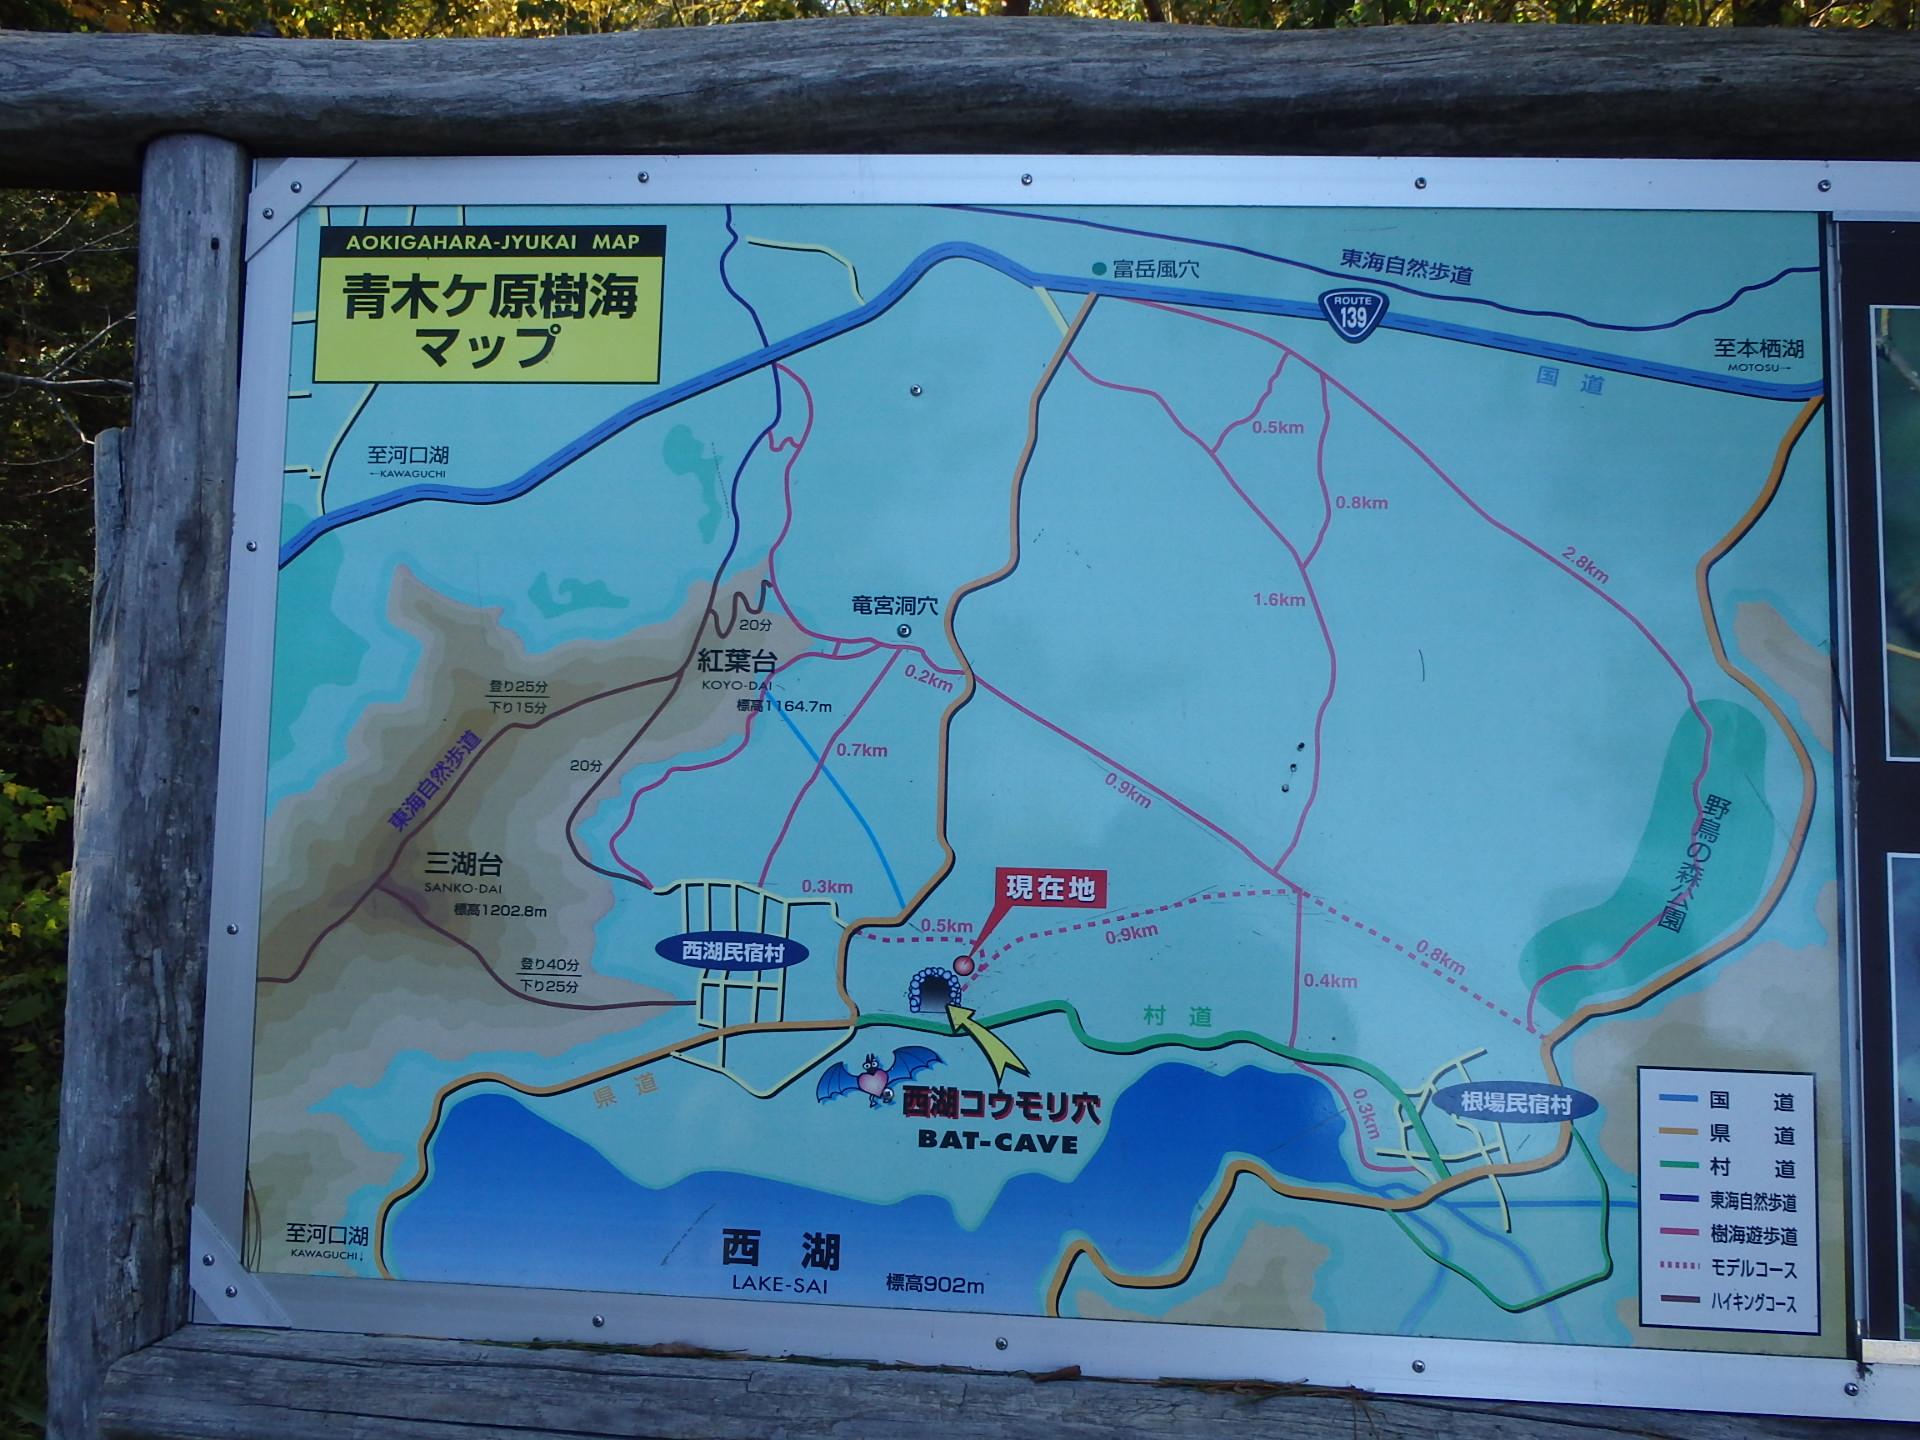 http://www.yamanashi-kankou.jp/blog/L43T9j_14.jpg